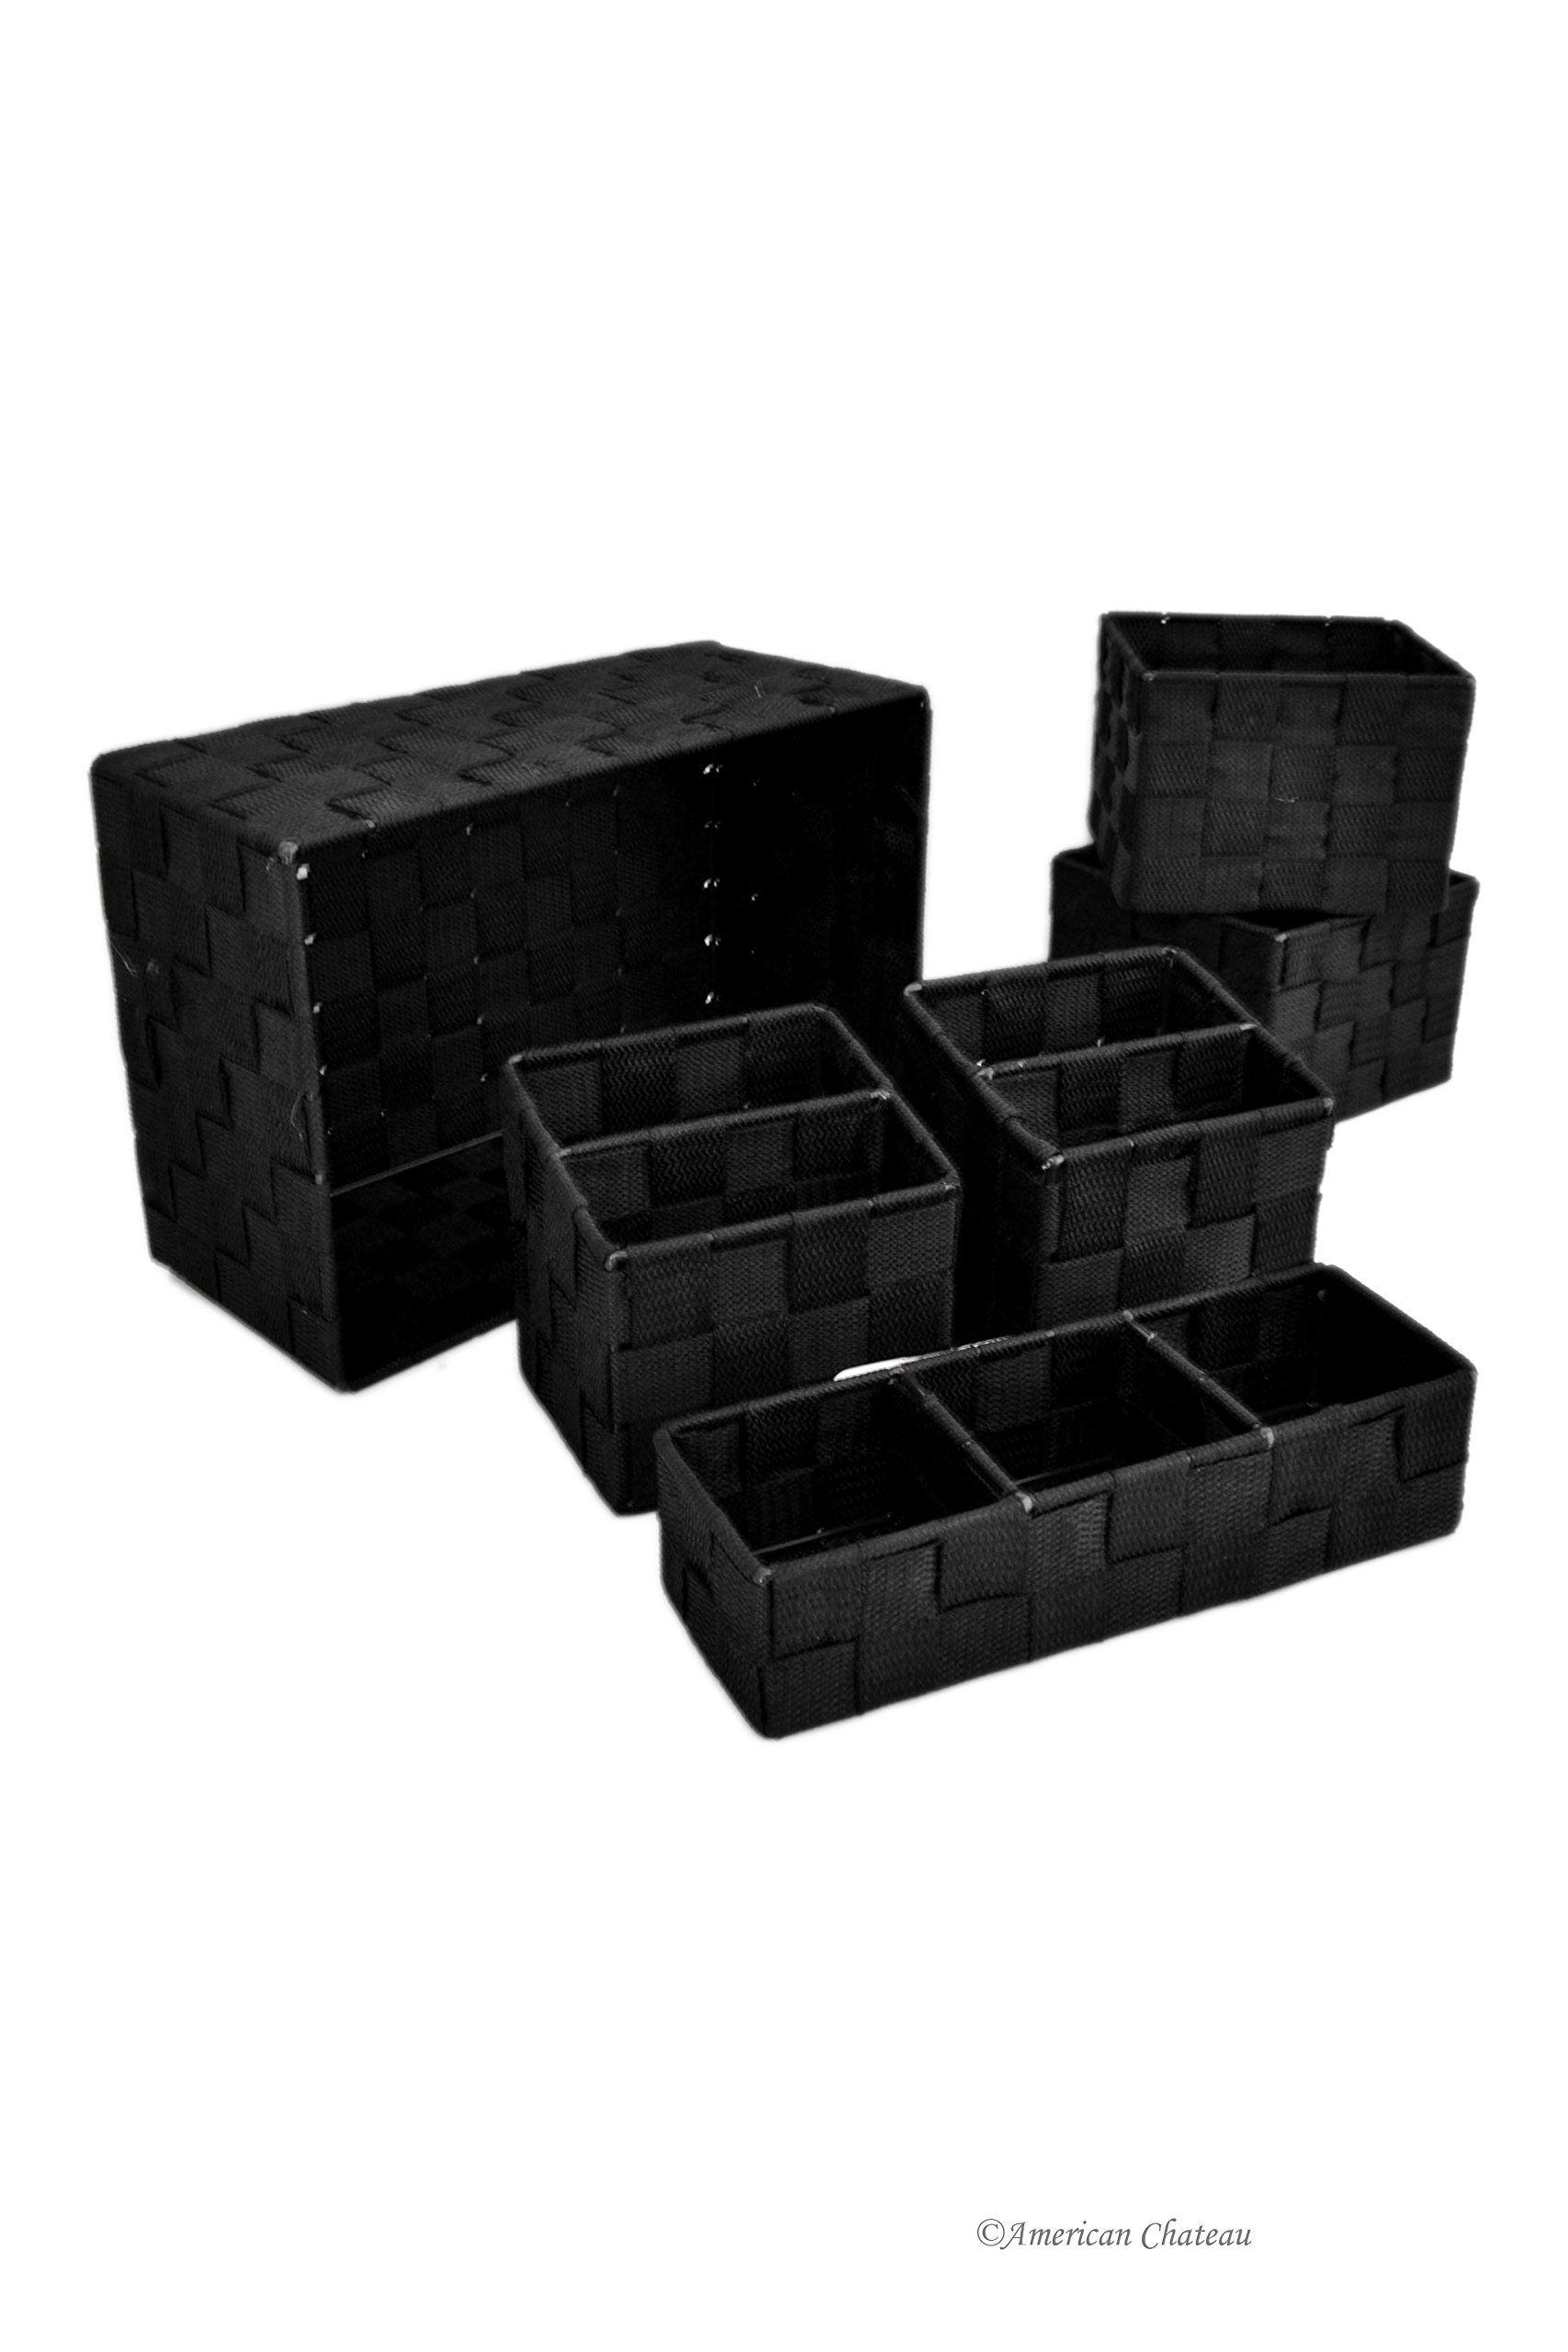 office storage baskets. Amazon.com - Set 6 Black Kitchen/Office Woven Nylon Storage Baskets Cabinet Drawer Office E